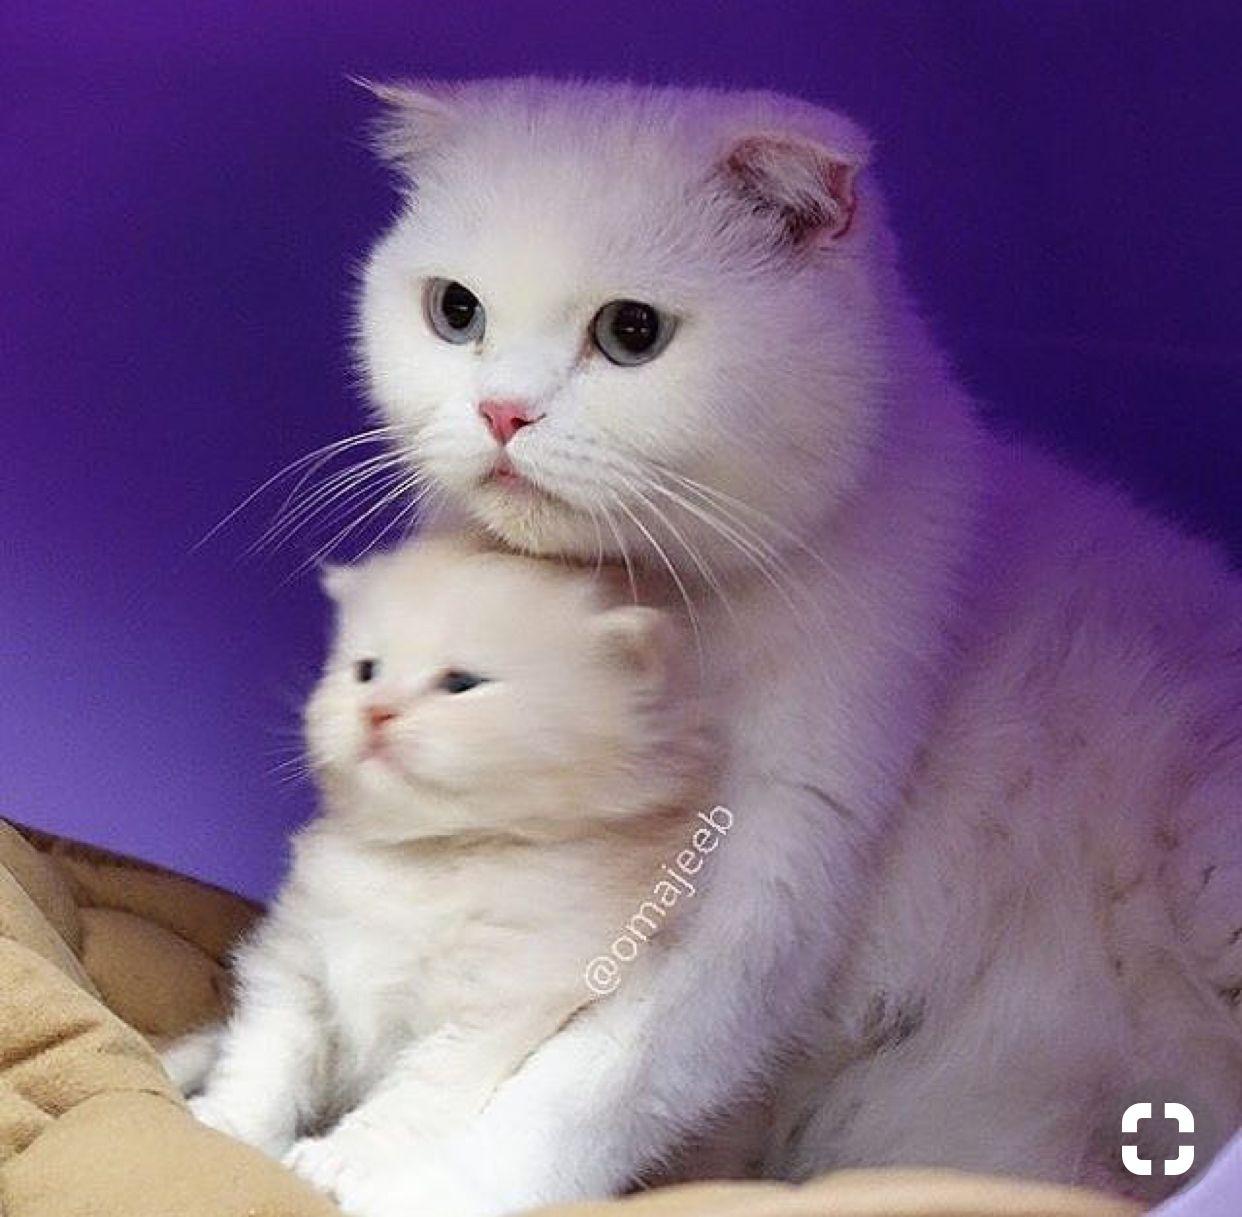 Pin by maggiehou on Melt Kittens cutest, Cute cats, Cute